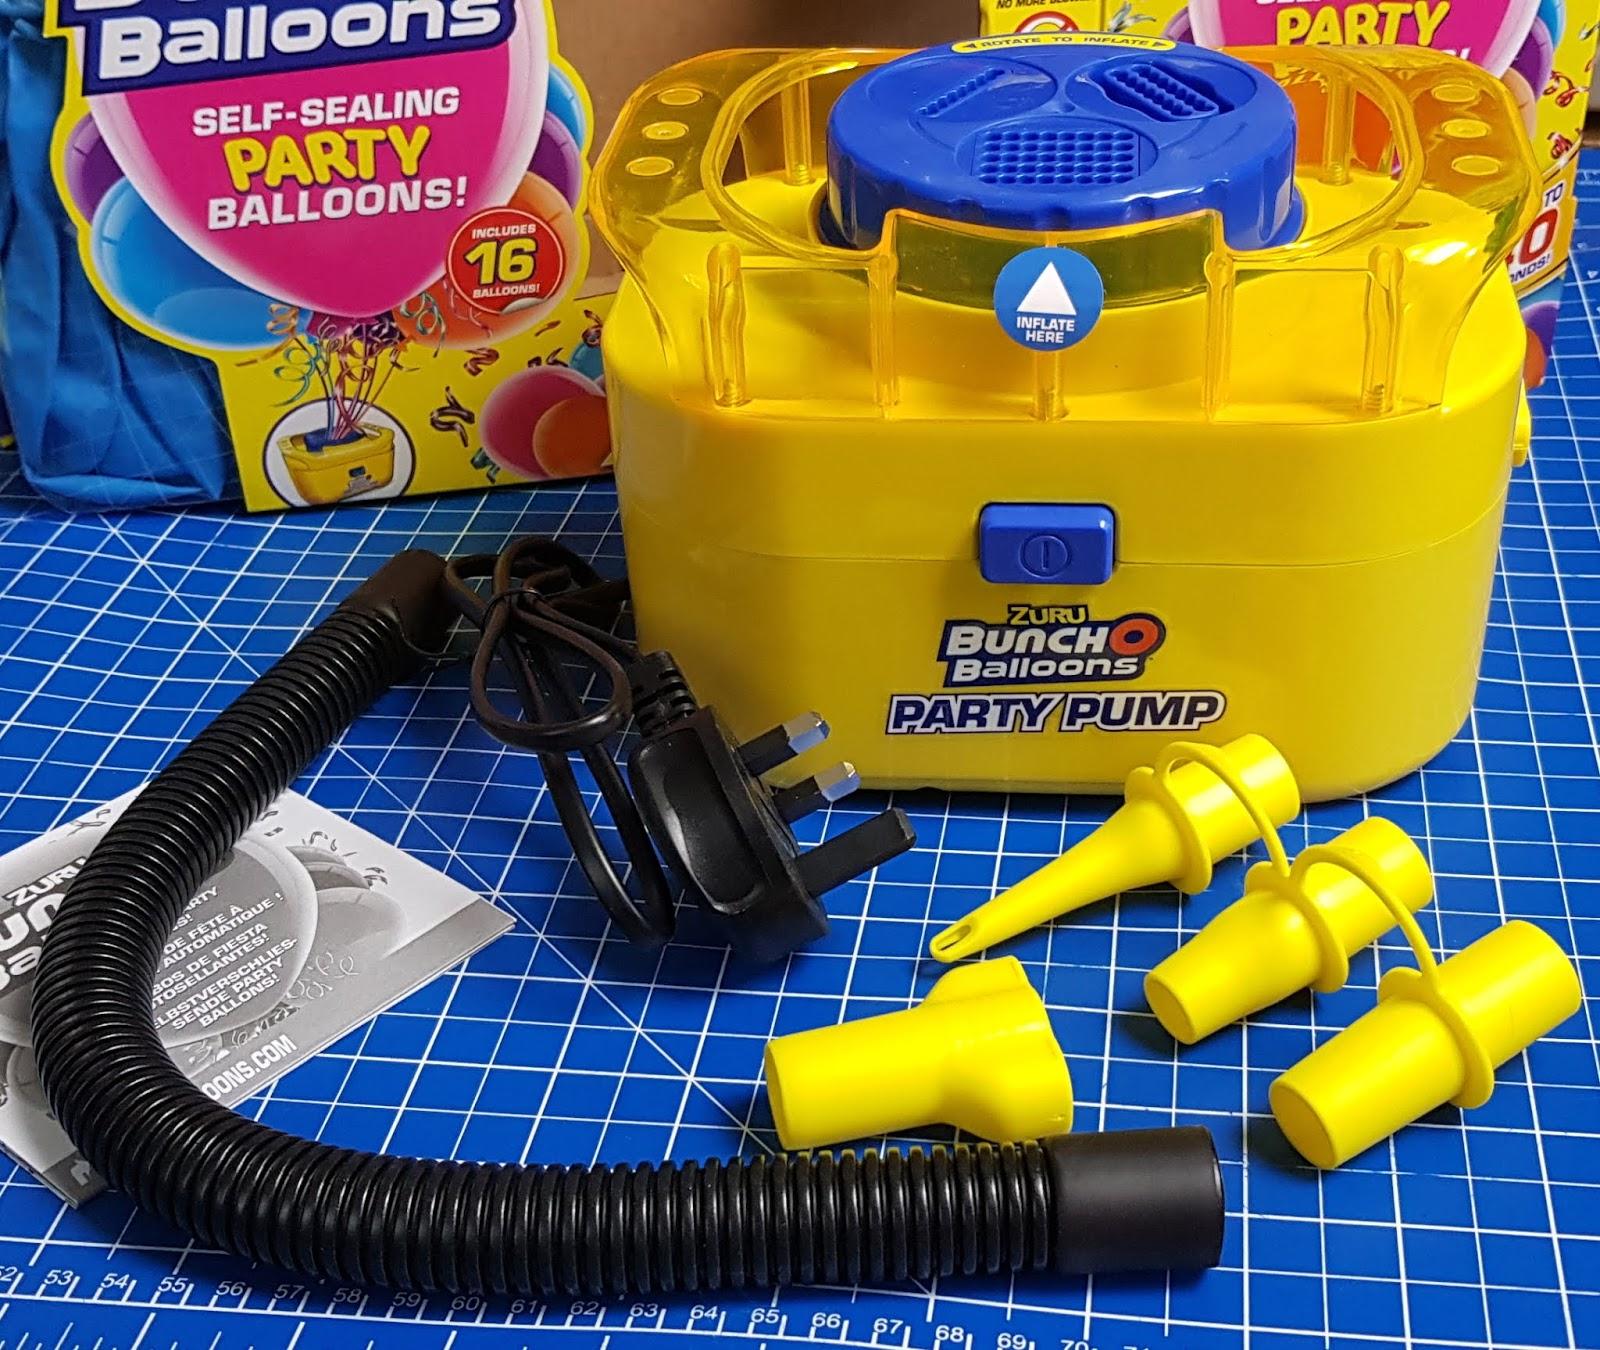 ZURU Bunch O Balloons Self Sealing Party Pump Electronic 16 Balloon Starter Pack